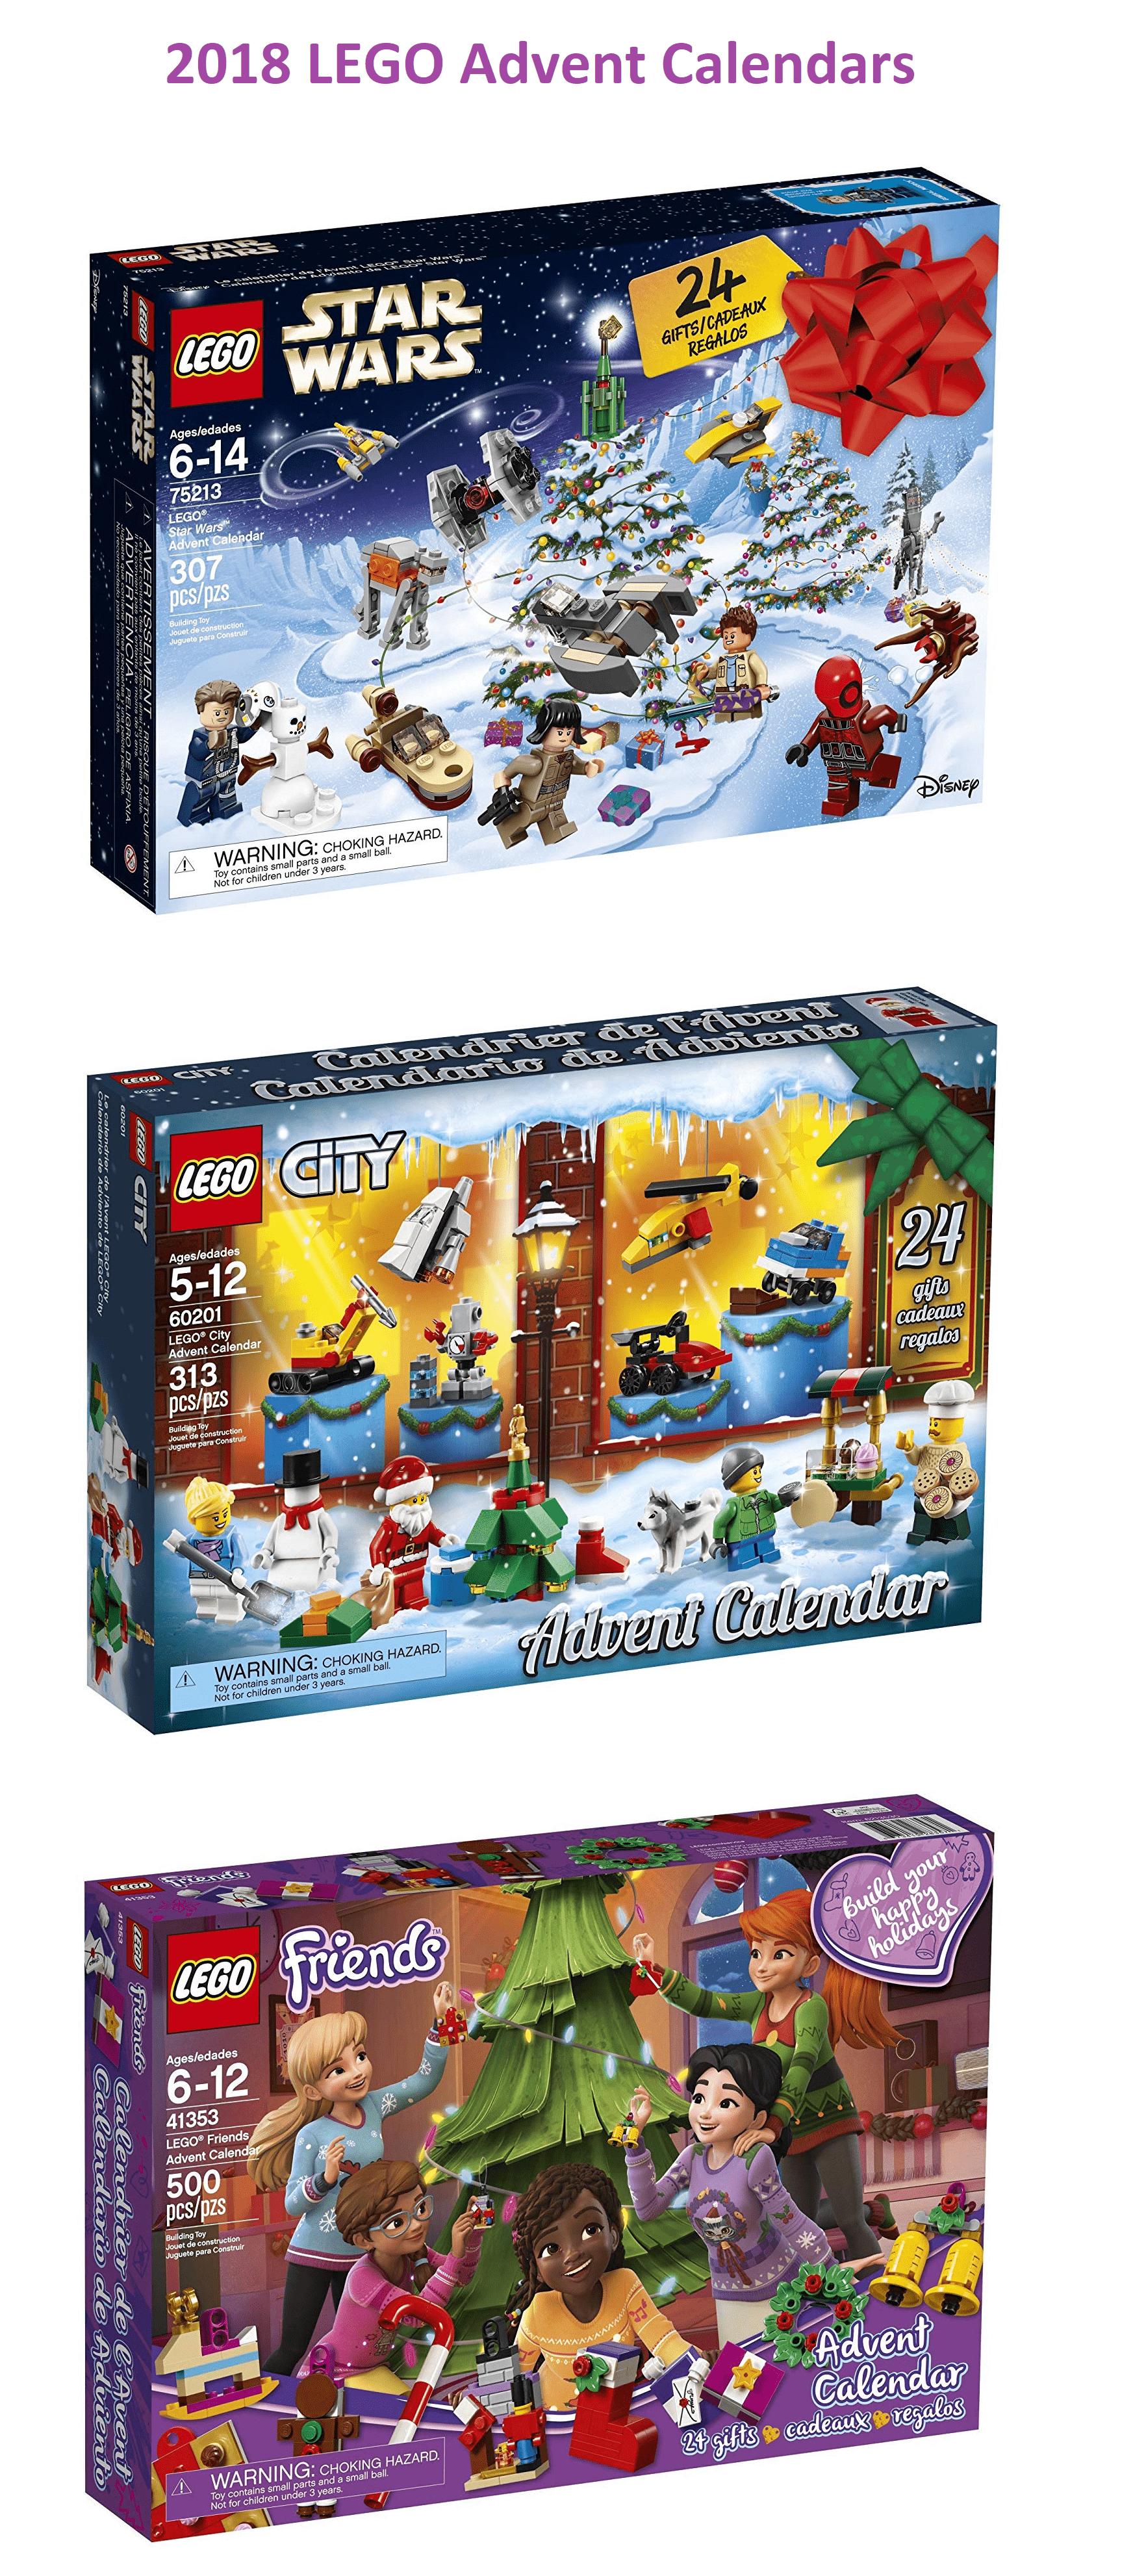 Lego 2018 Advent Calendars Available Now Star Wars Friends City Town Hello Subscription Lego City Advent Calendar Lego Advent Calendar Star Wars Advent Calendar